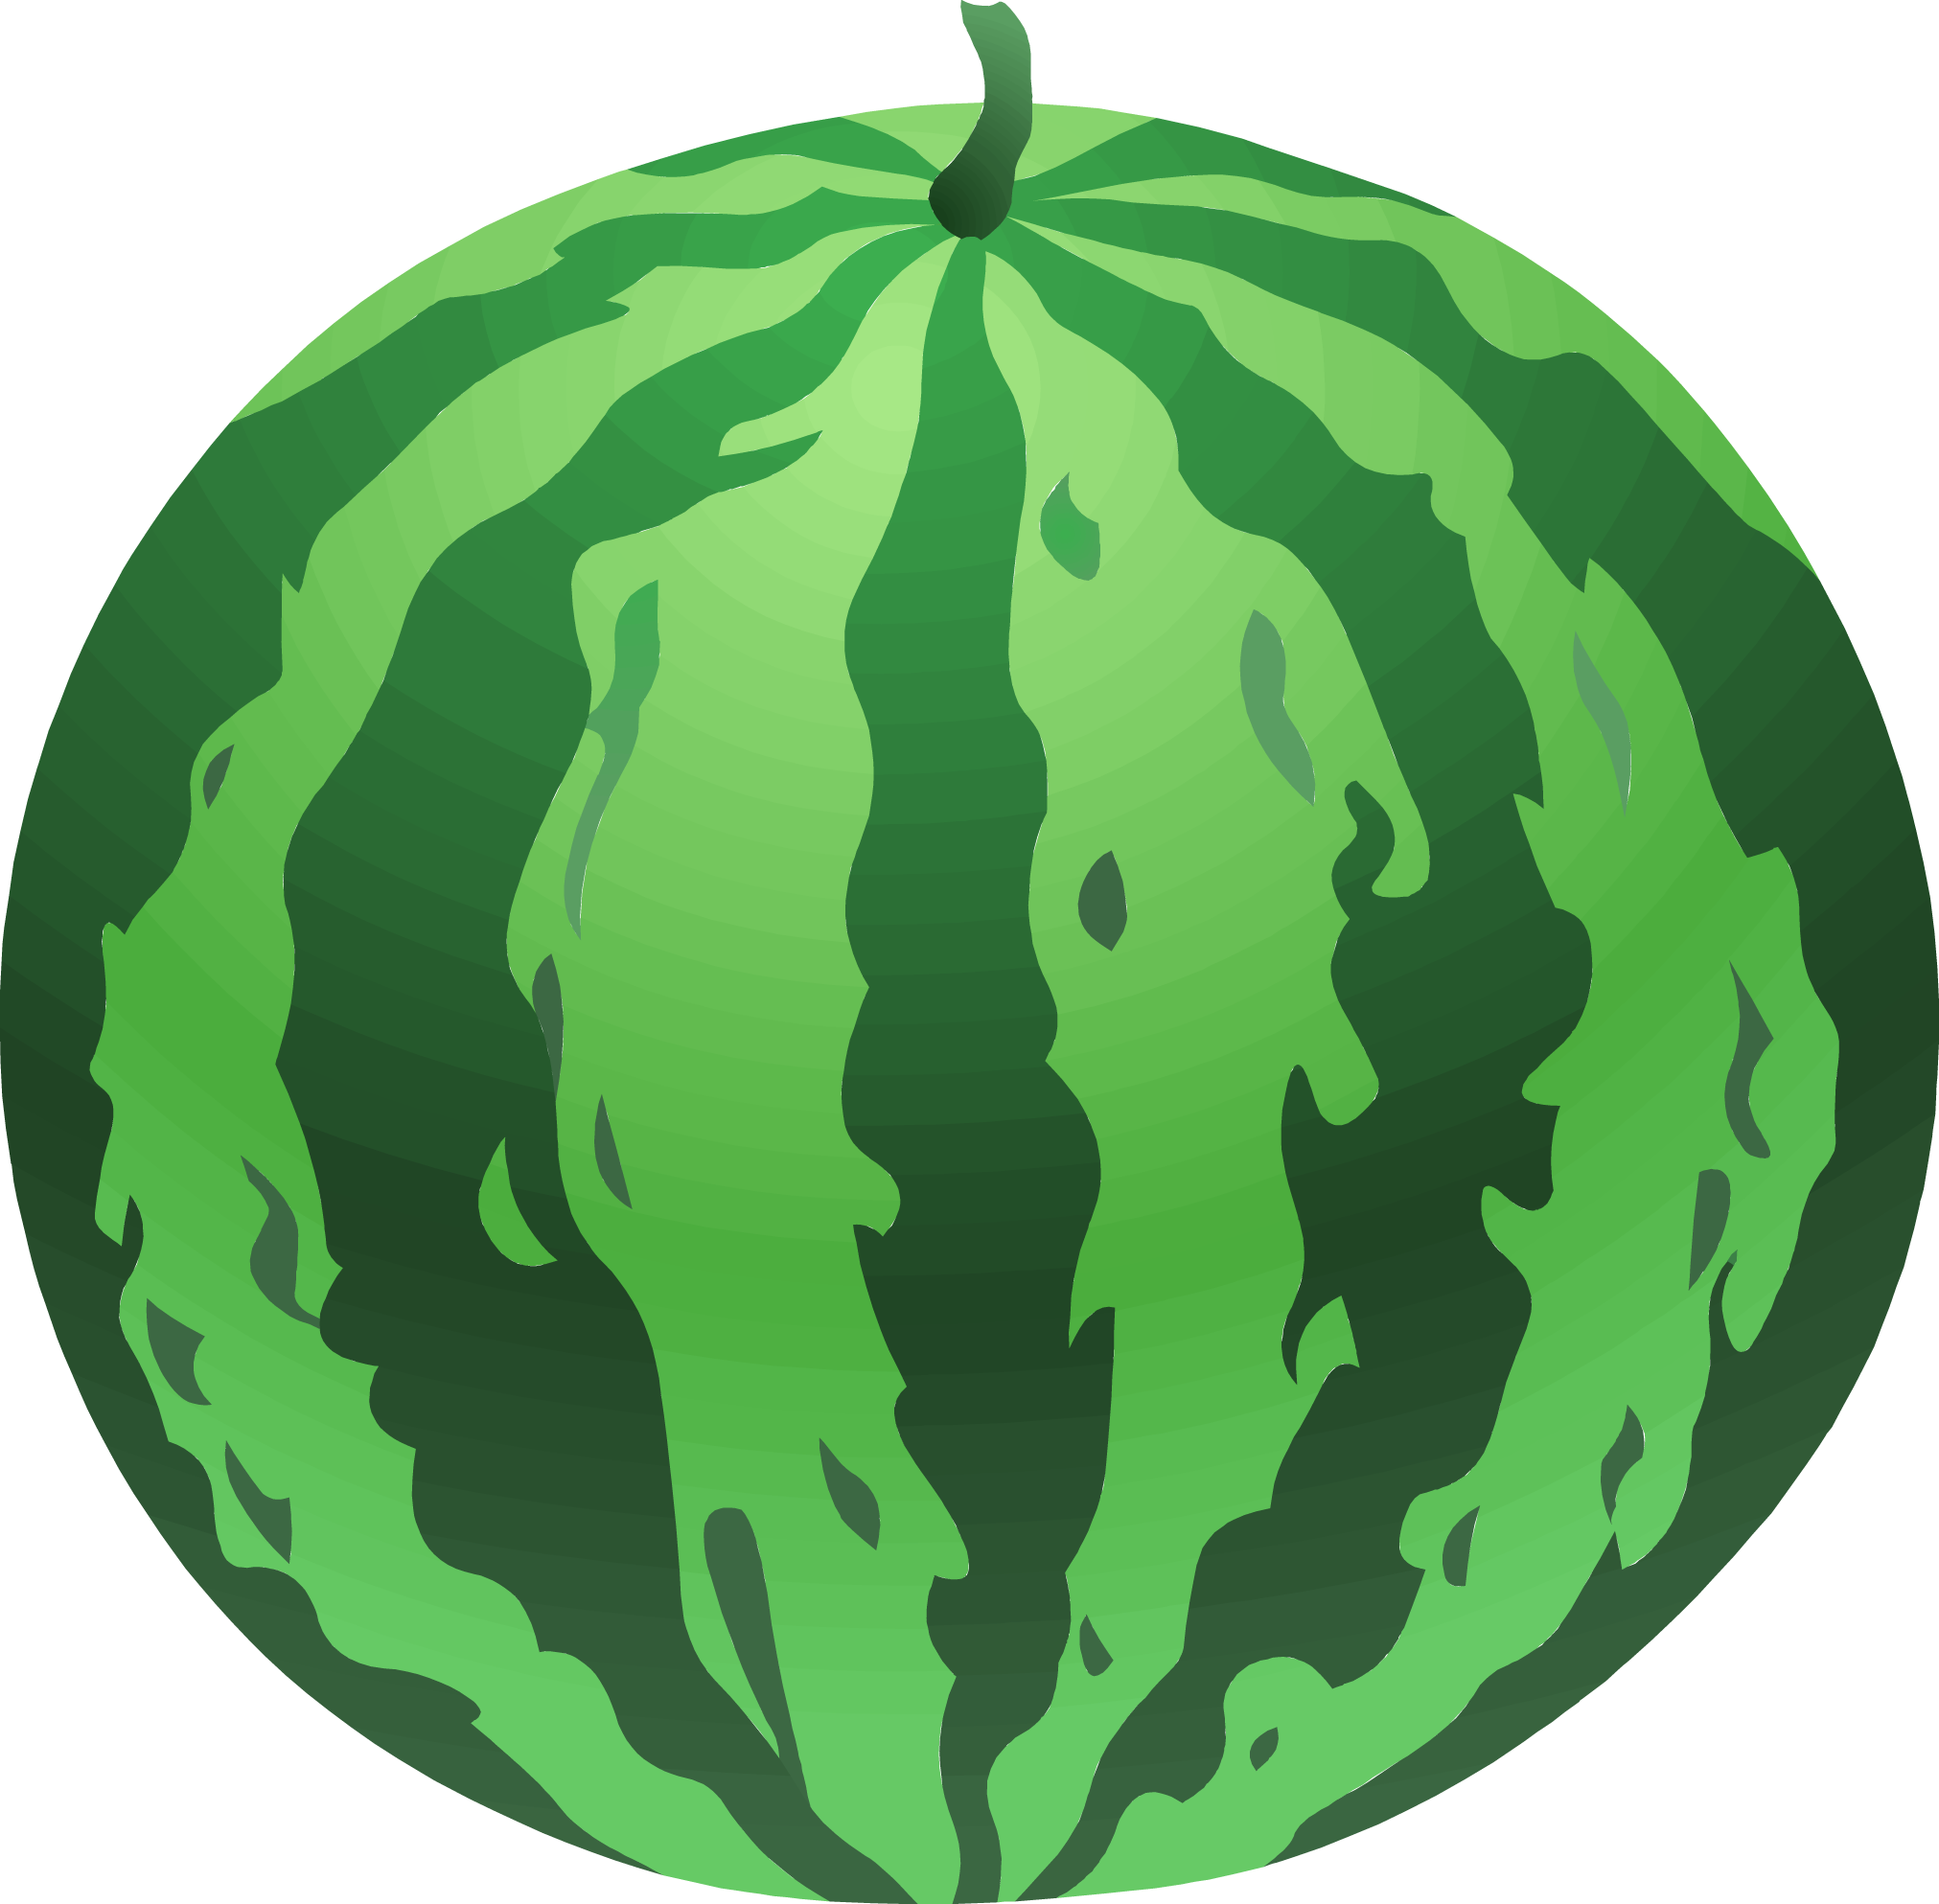 Free clip art image. 1 clipart watermelon